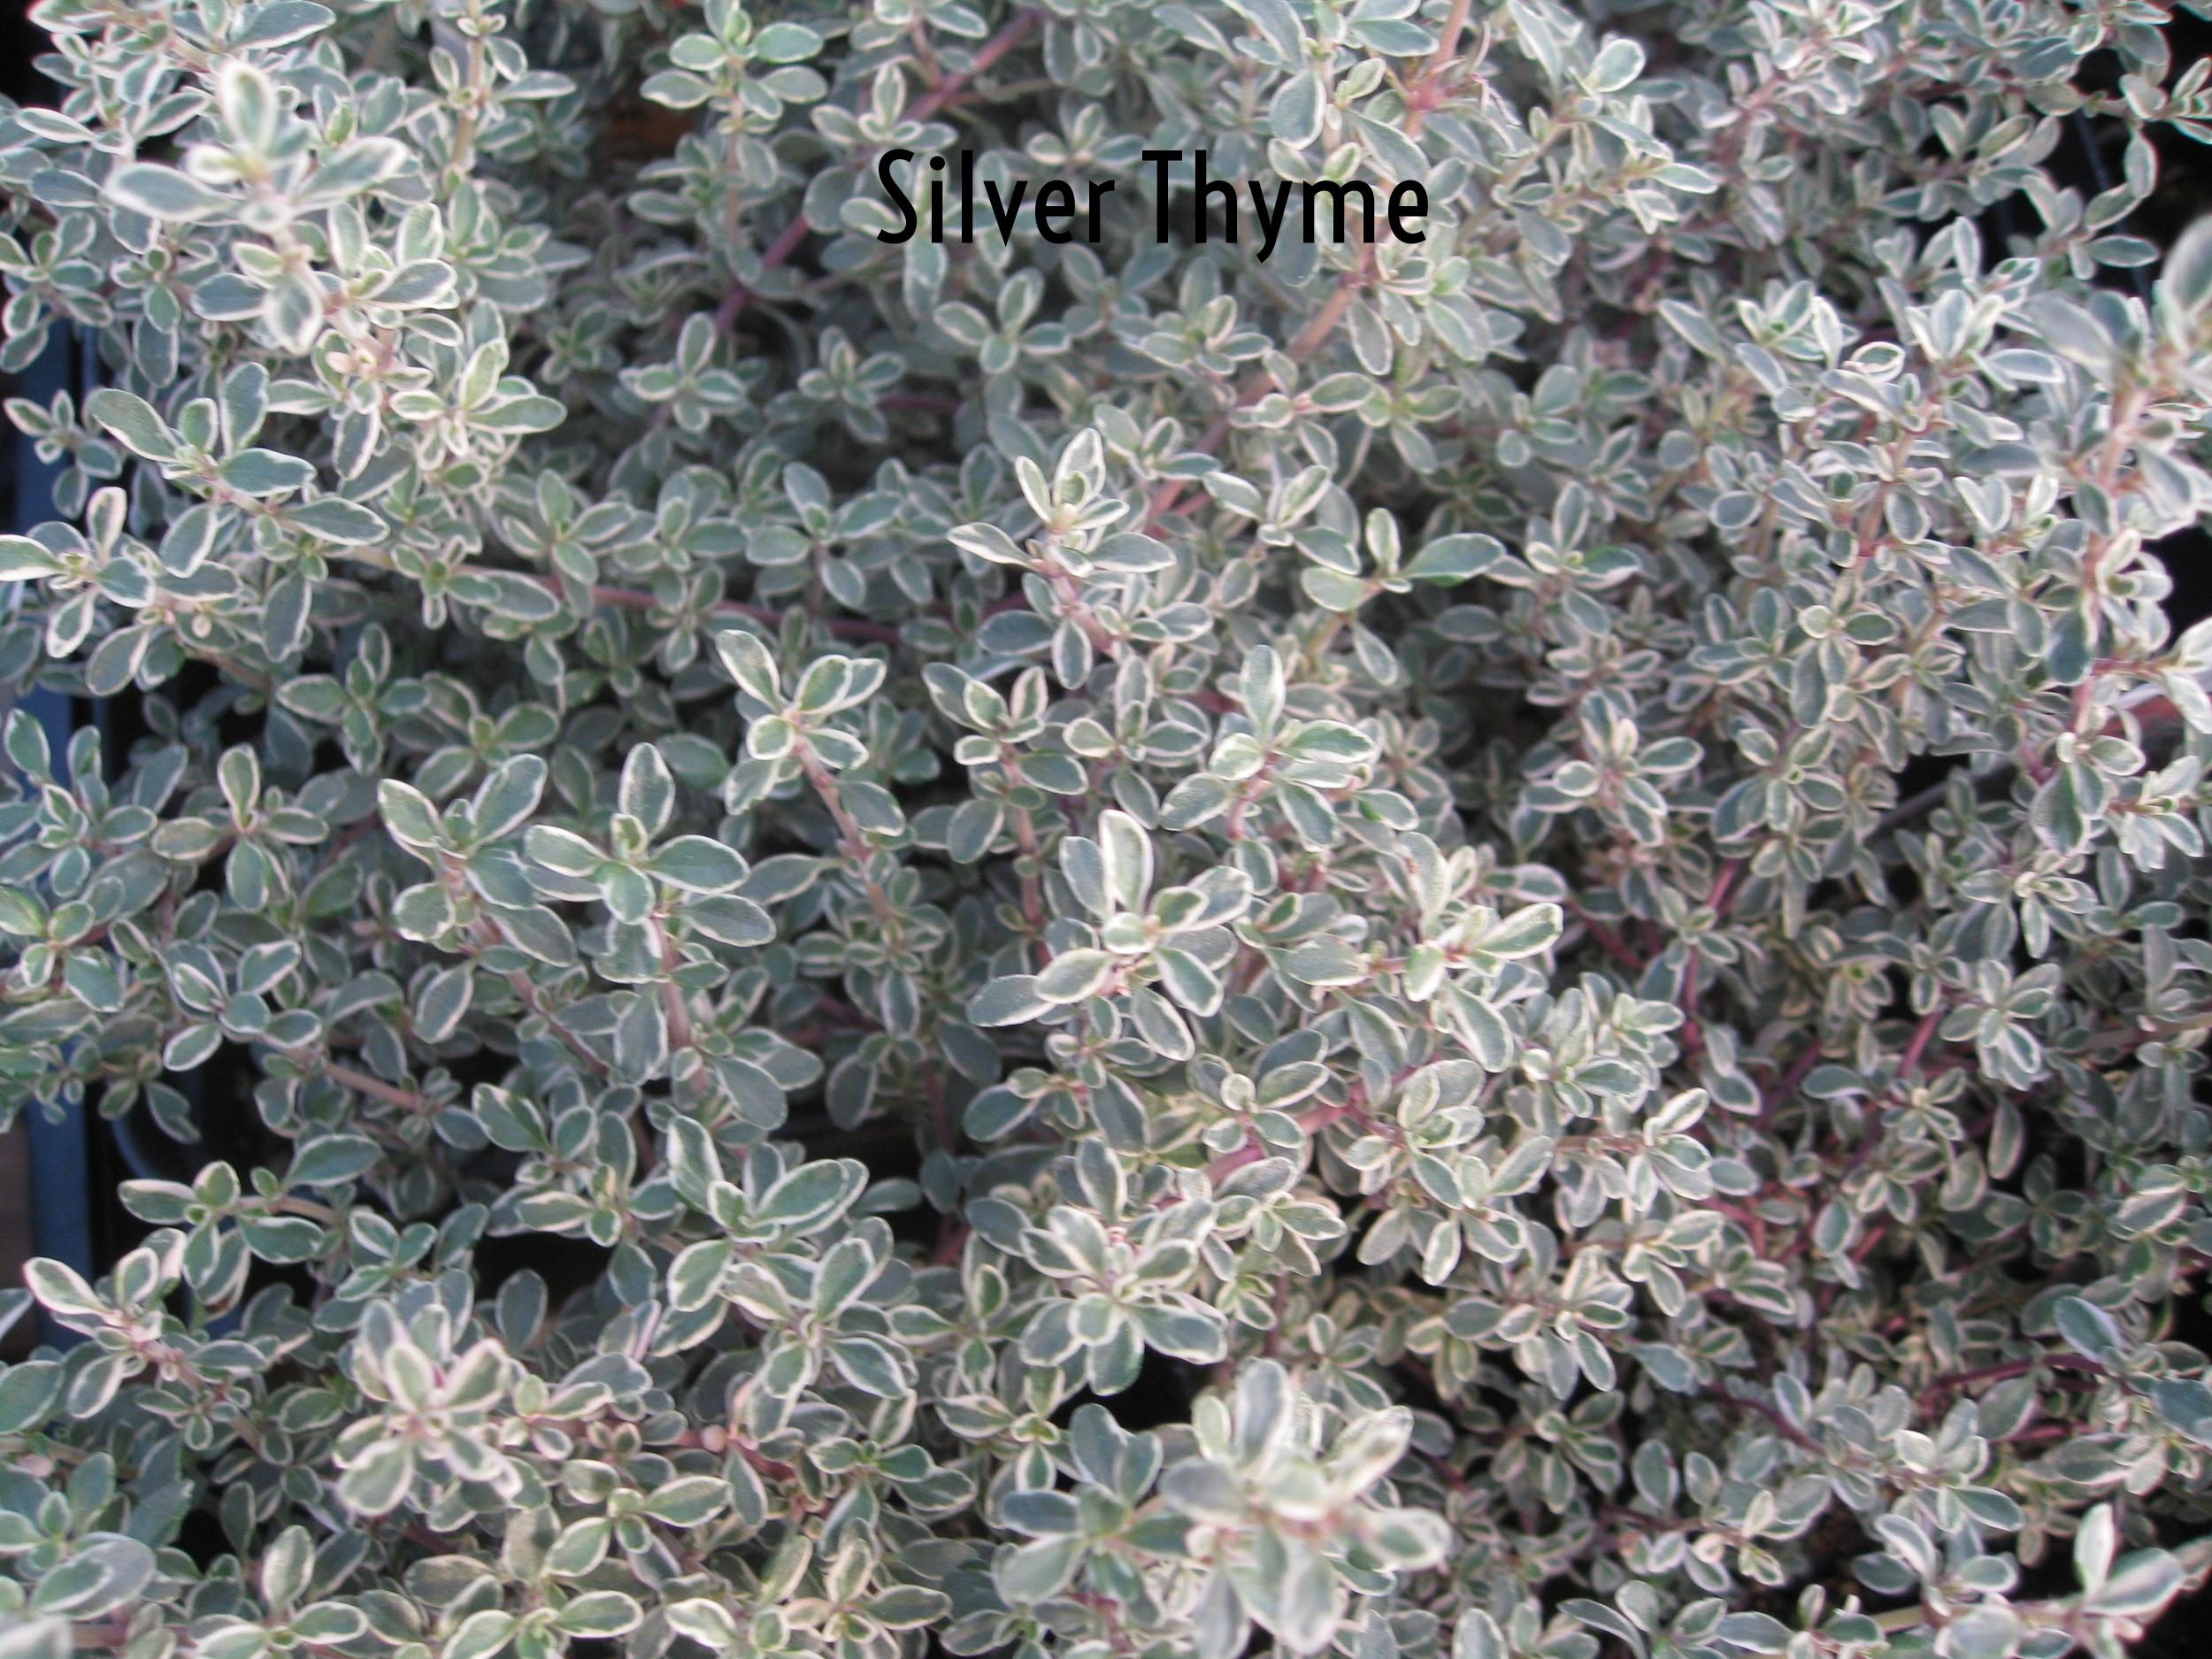 silver thyme.jpg